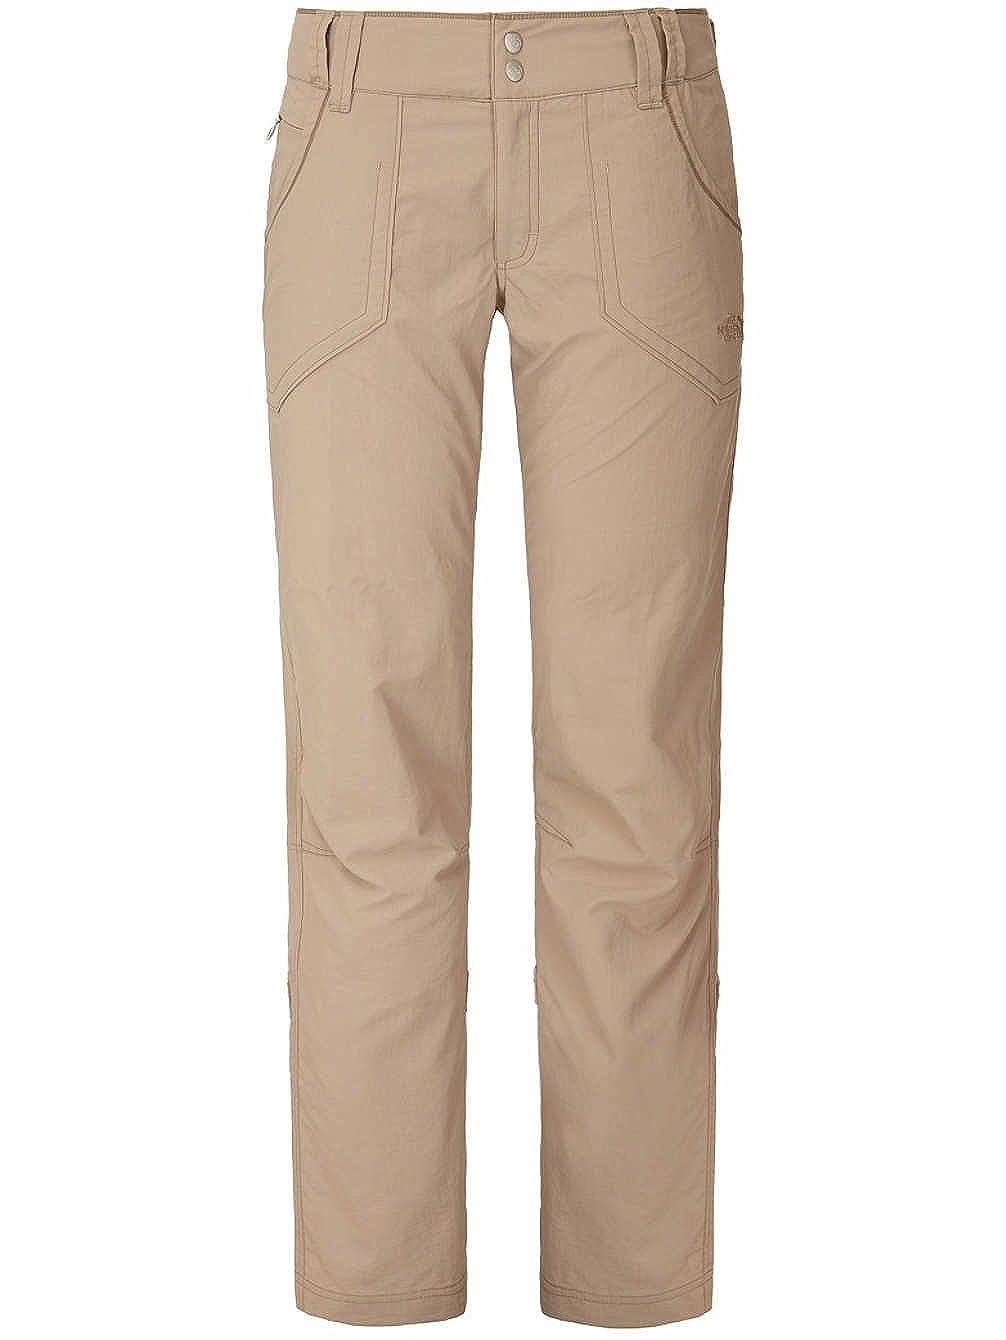 The North Face Horizon Tempest Plus Pantalones Largos de la Mujer